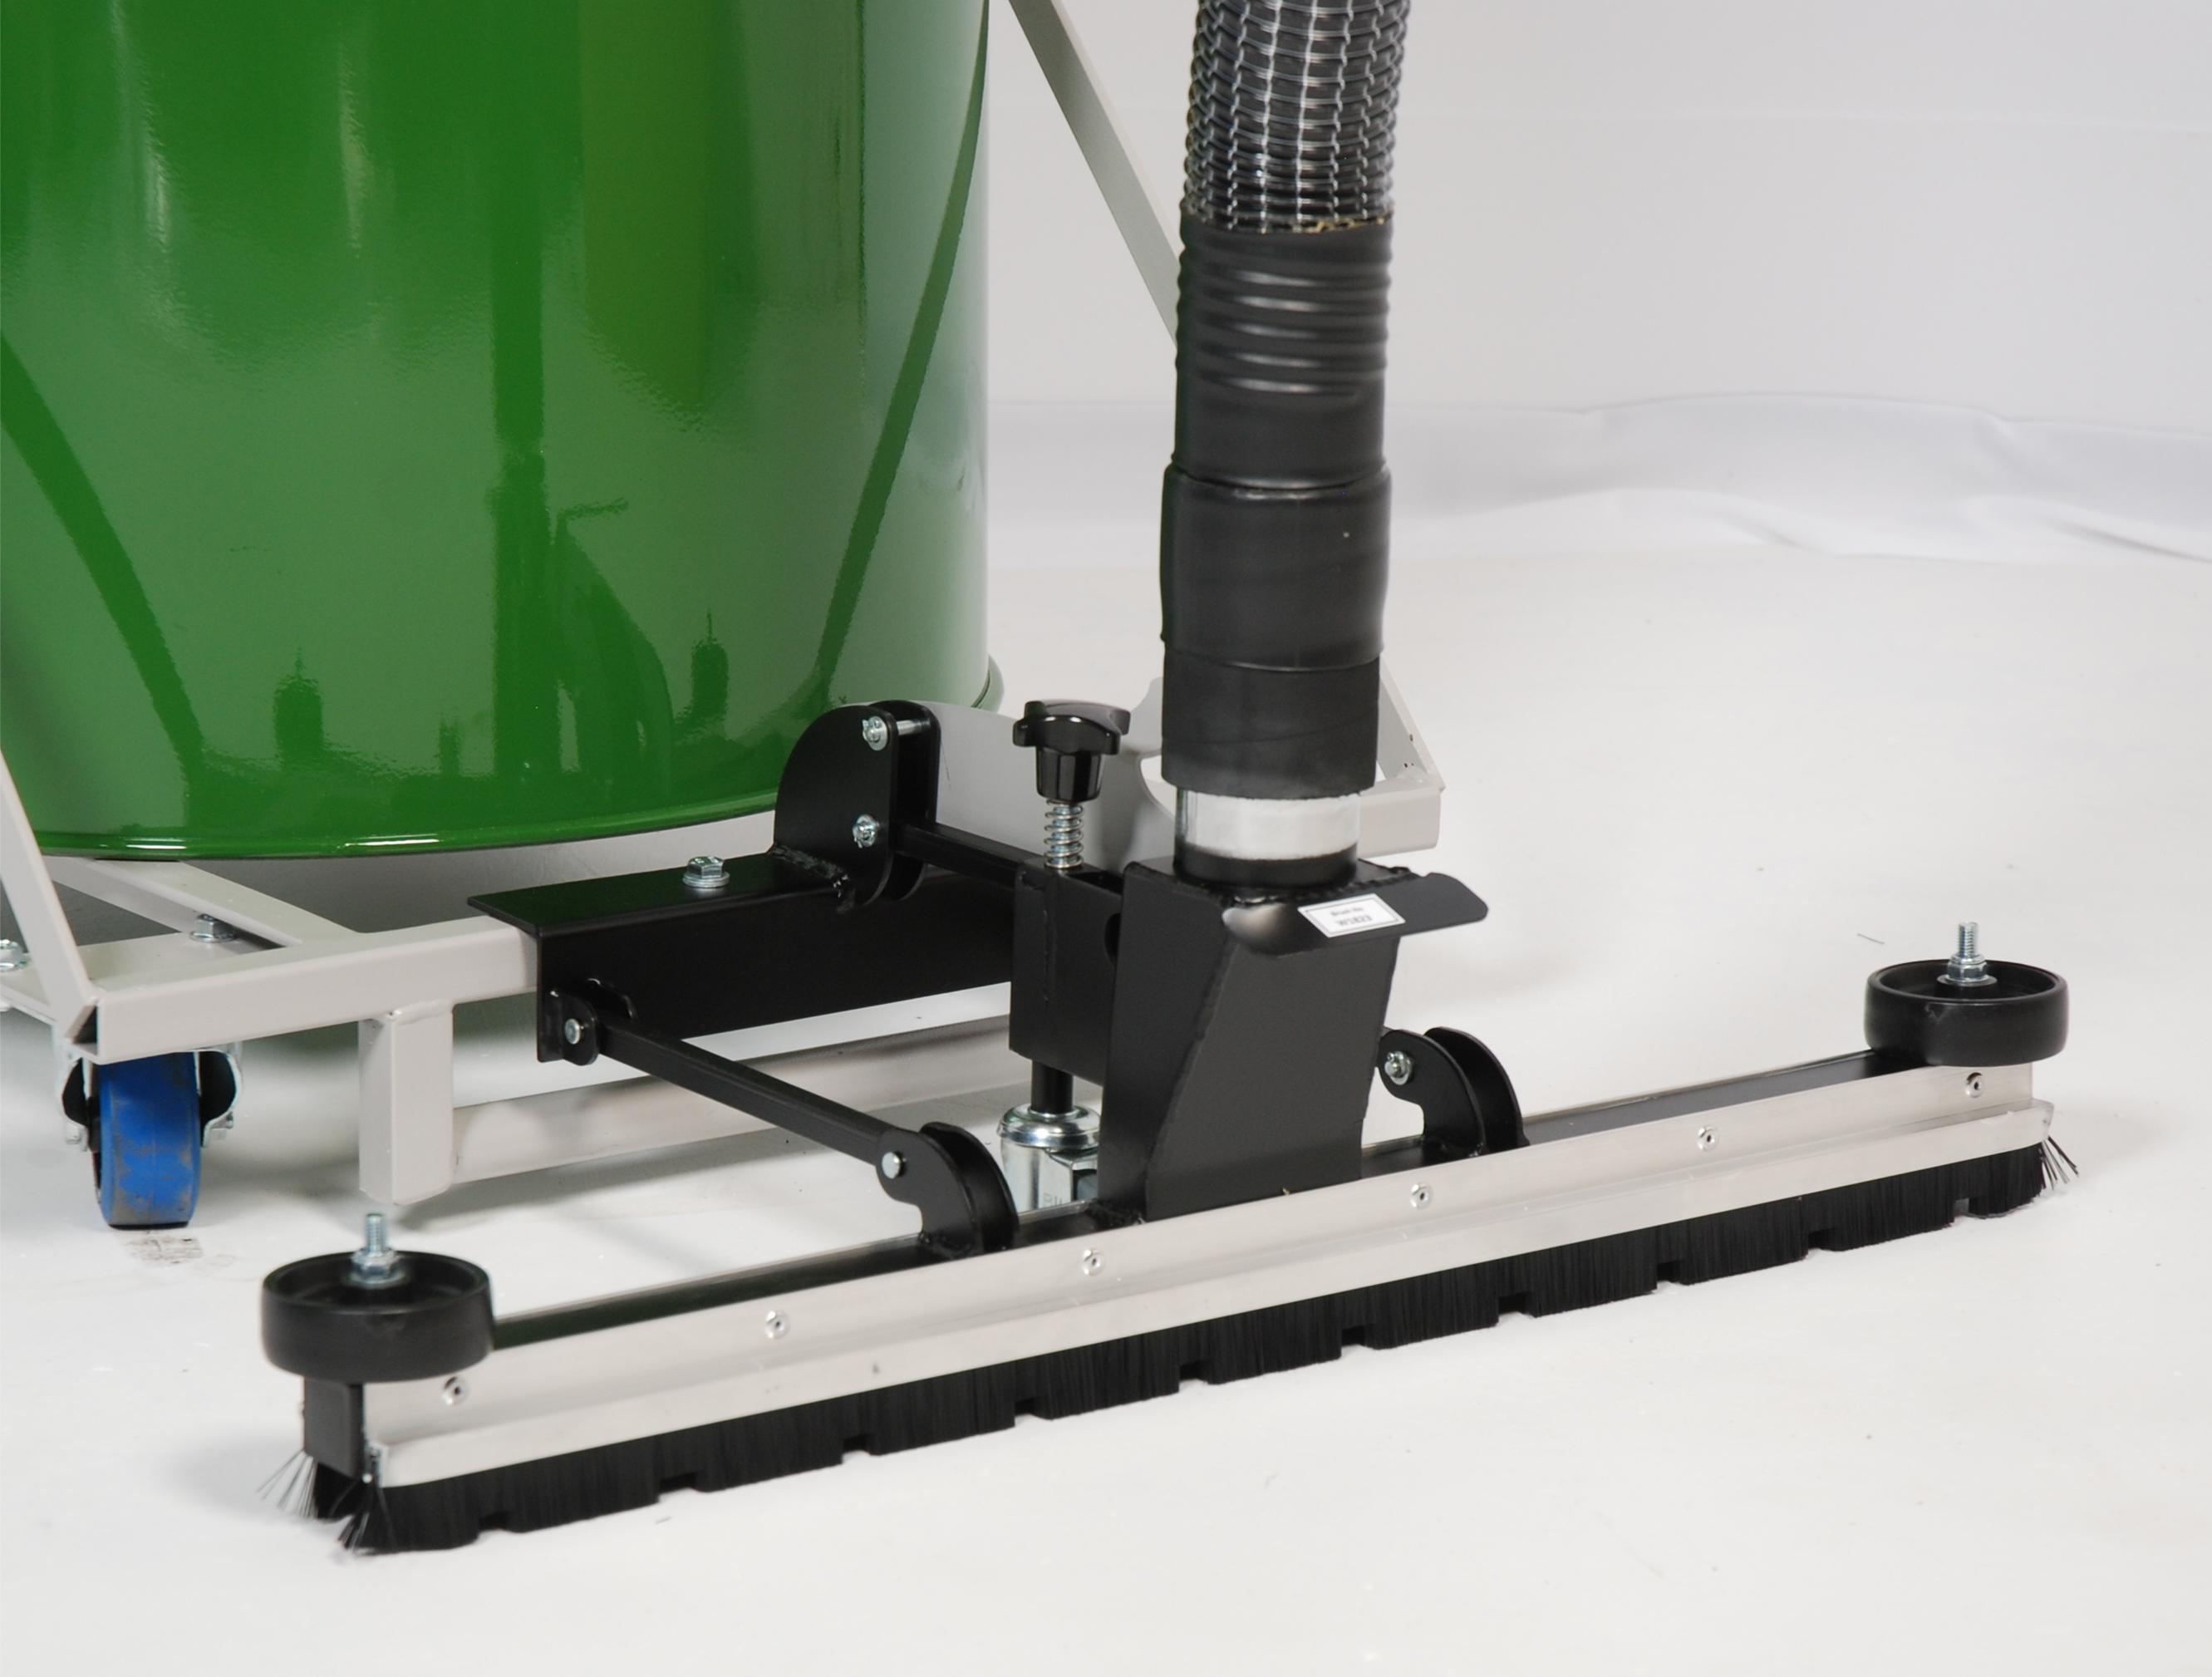 Warehouseman Industrial Vacuum Floor Brush